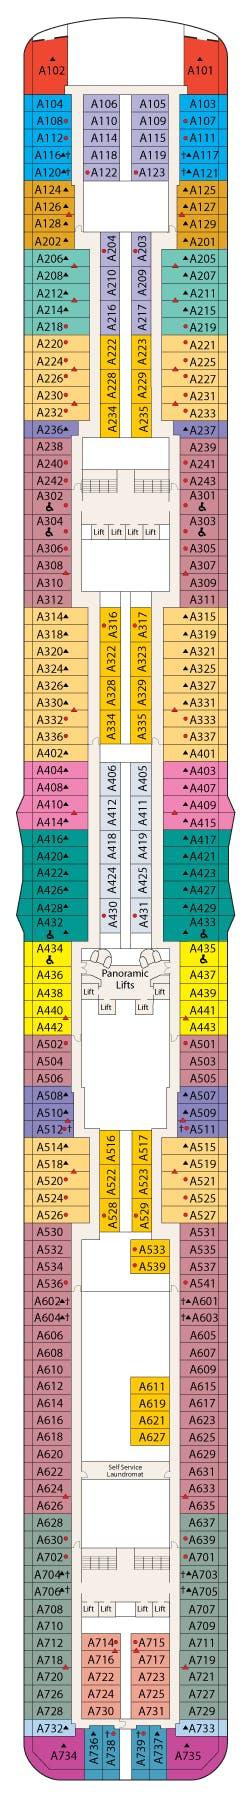 Deck 12 - Aloha Deck